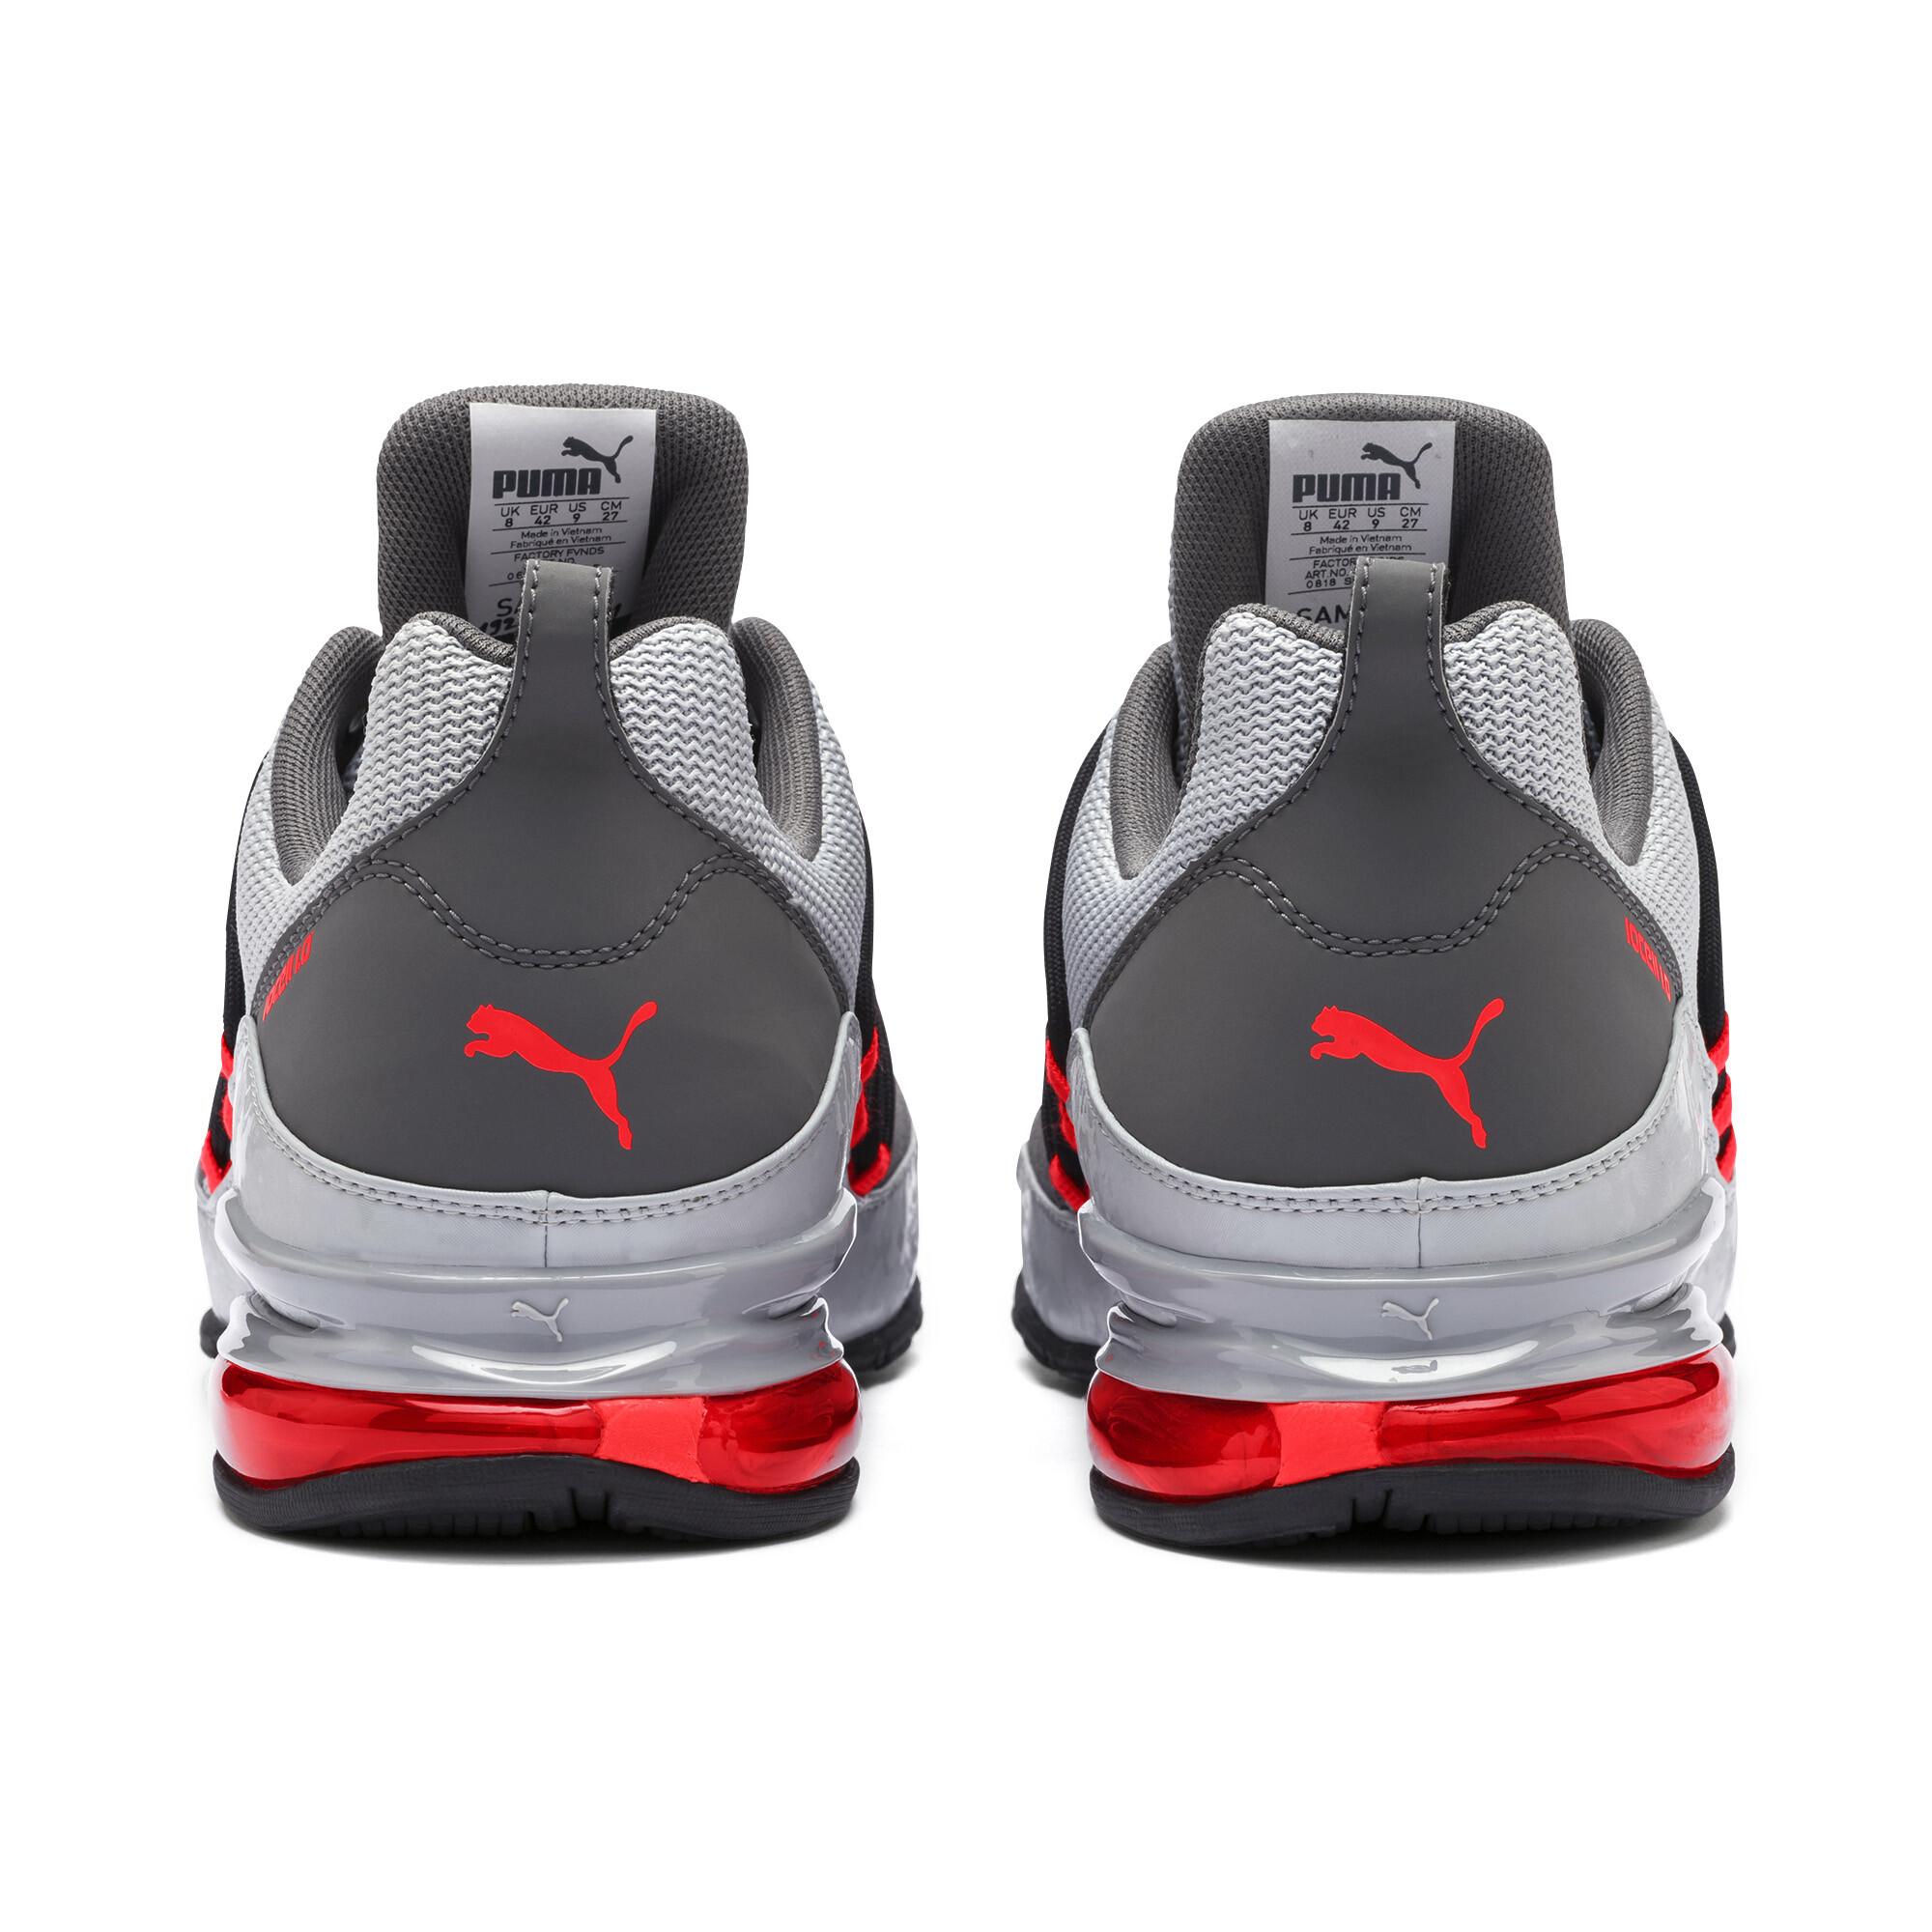 PUMA-CELL-Regulate-Camo-Men-s-Training-Shoes-Men-Shoe-Running thumbnail 3